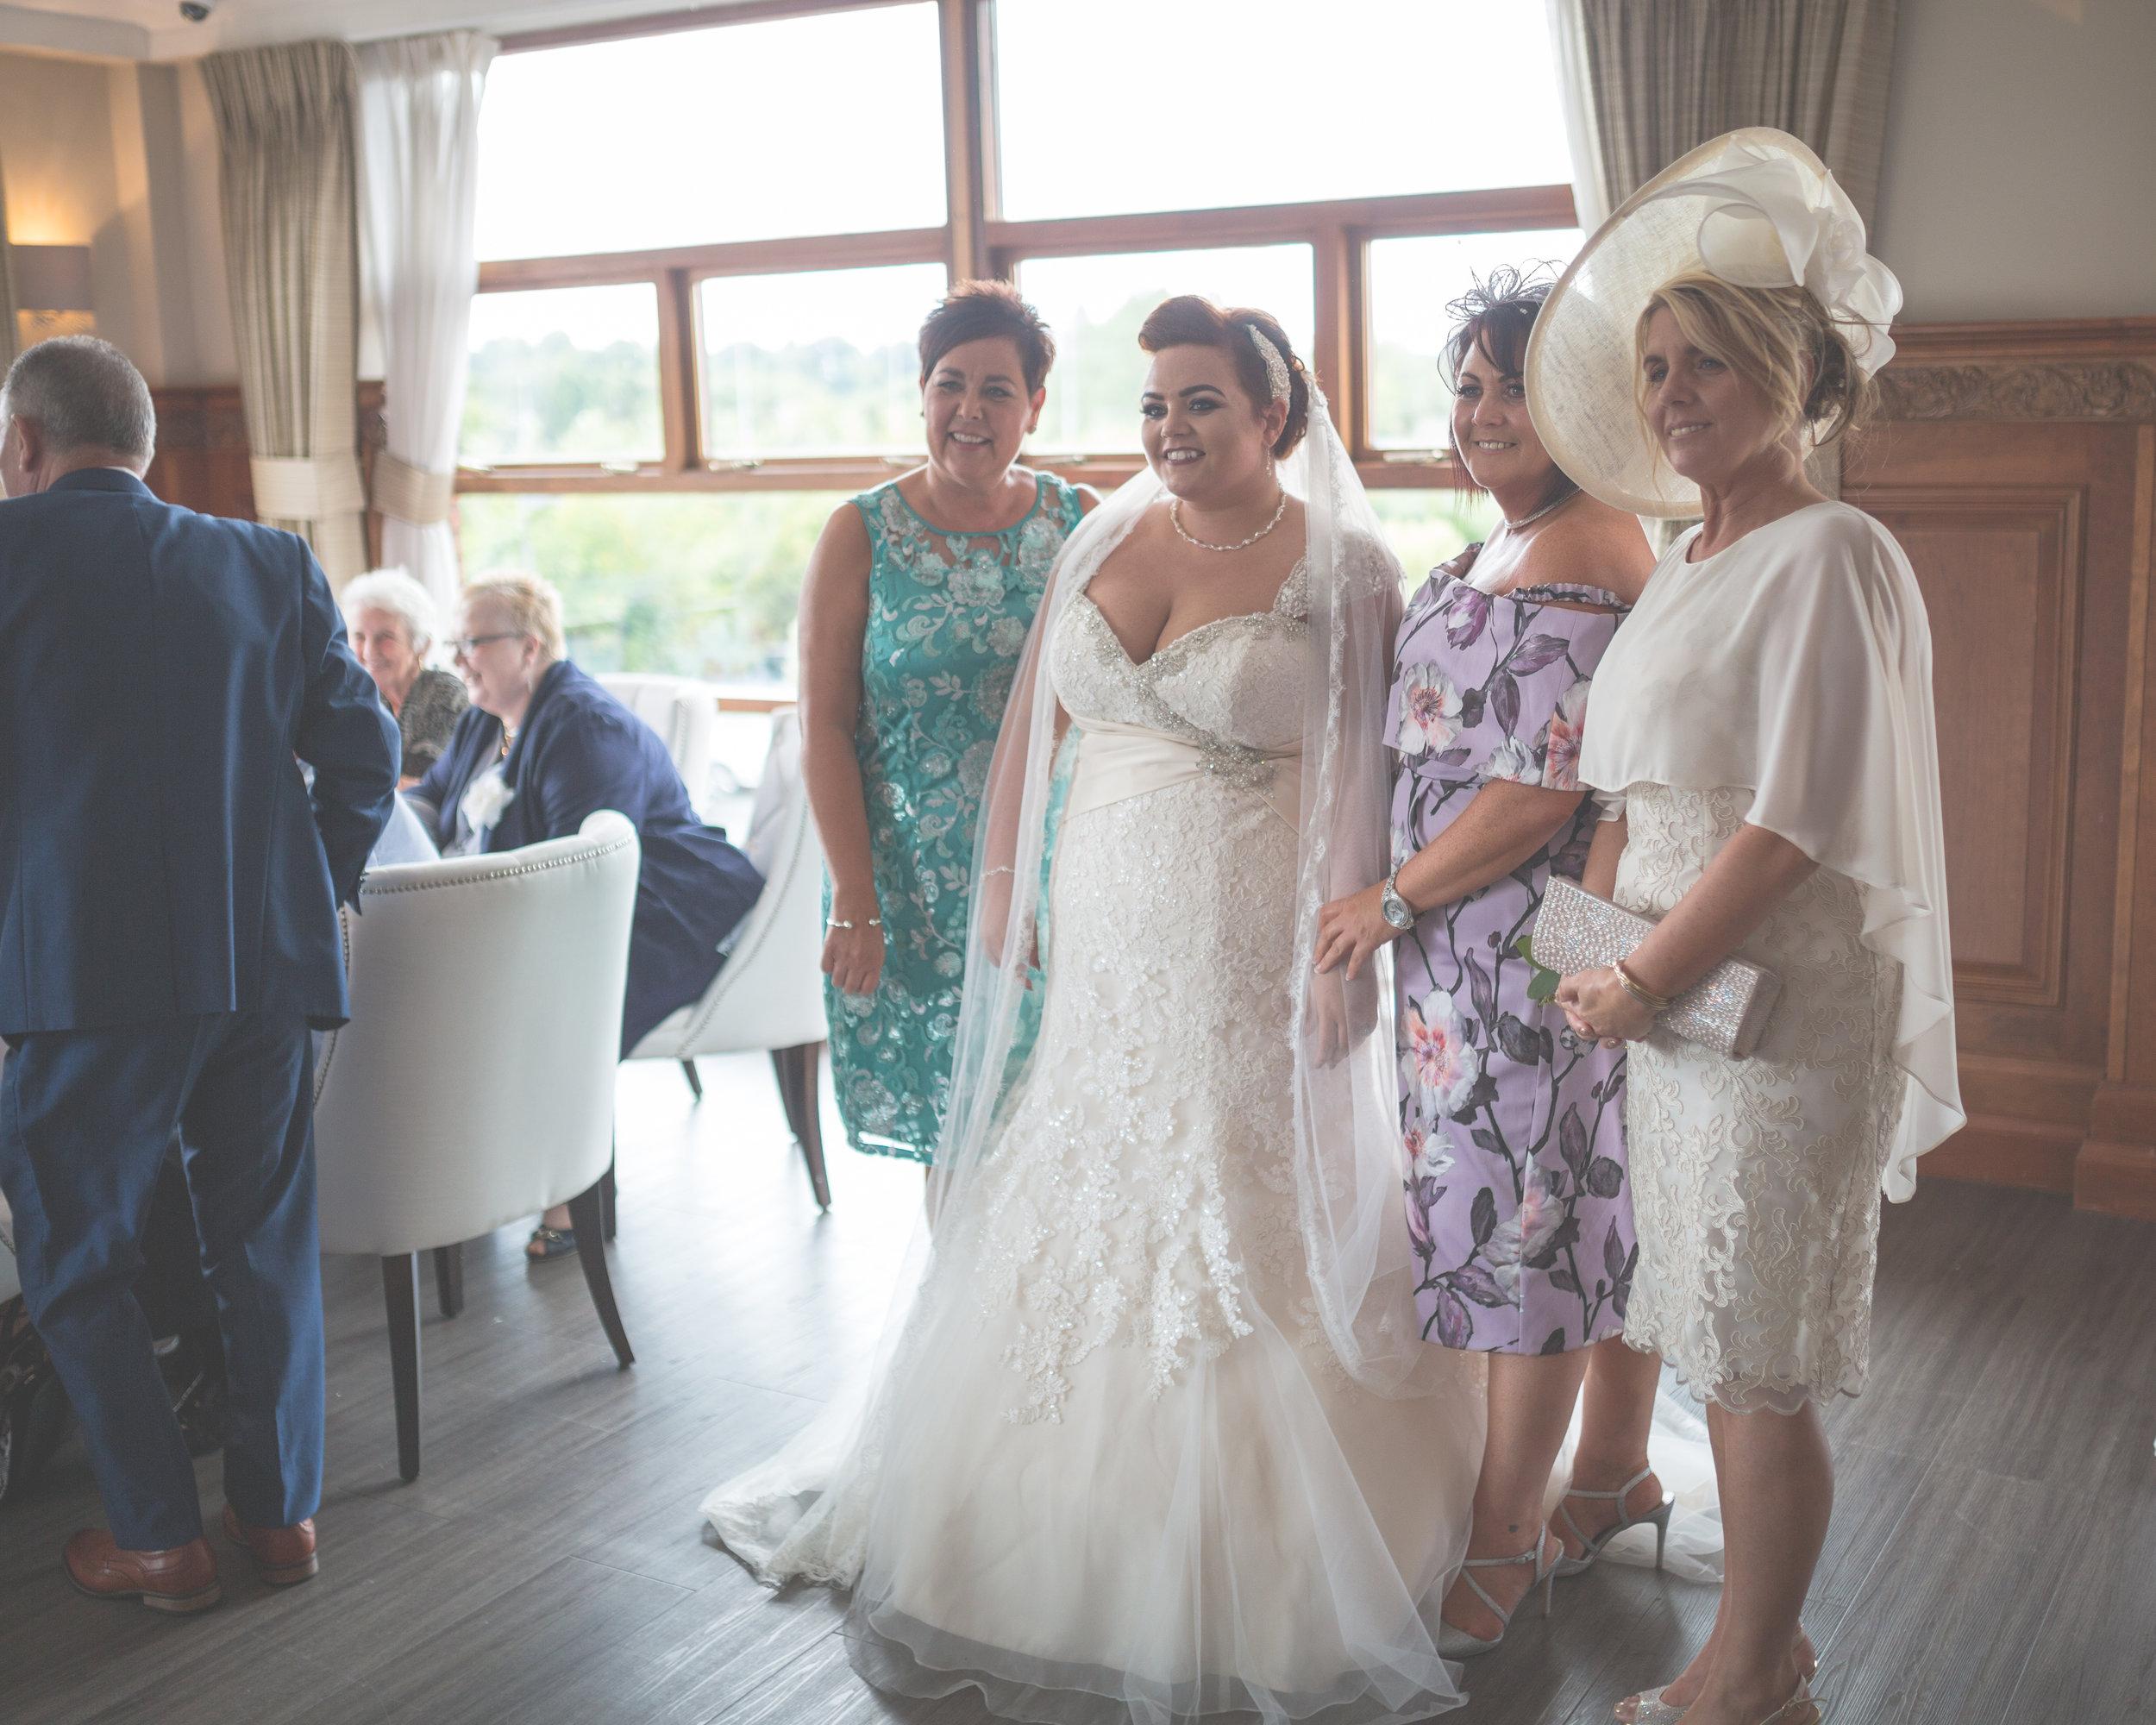 Antoinette & Stephen - Portraits   Brian McEwan Photography   Wedding Photographer Northern Ireland 111.jpg